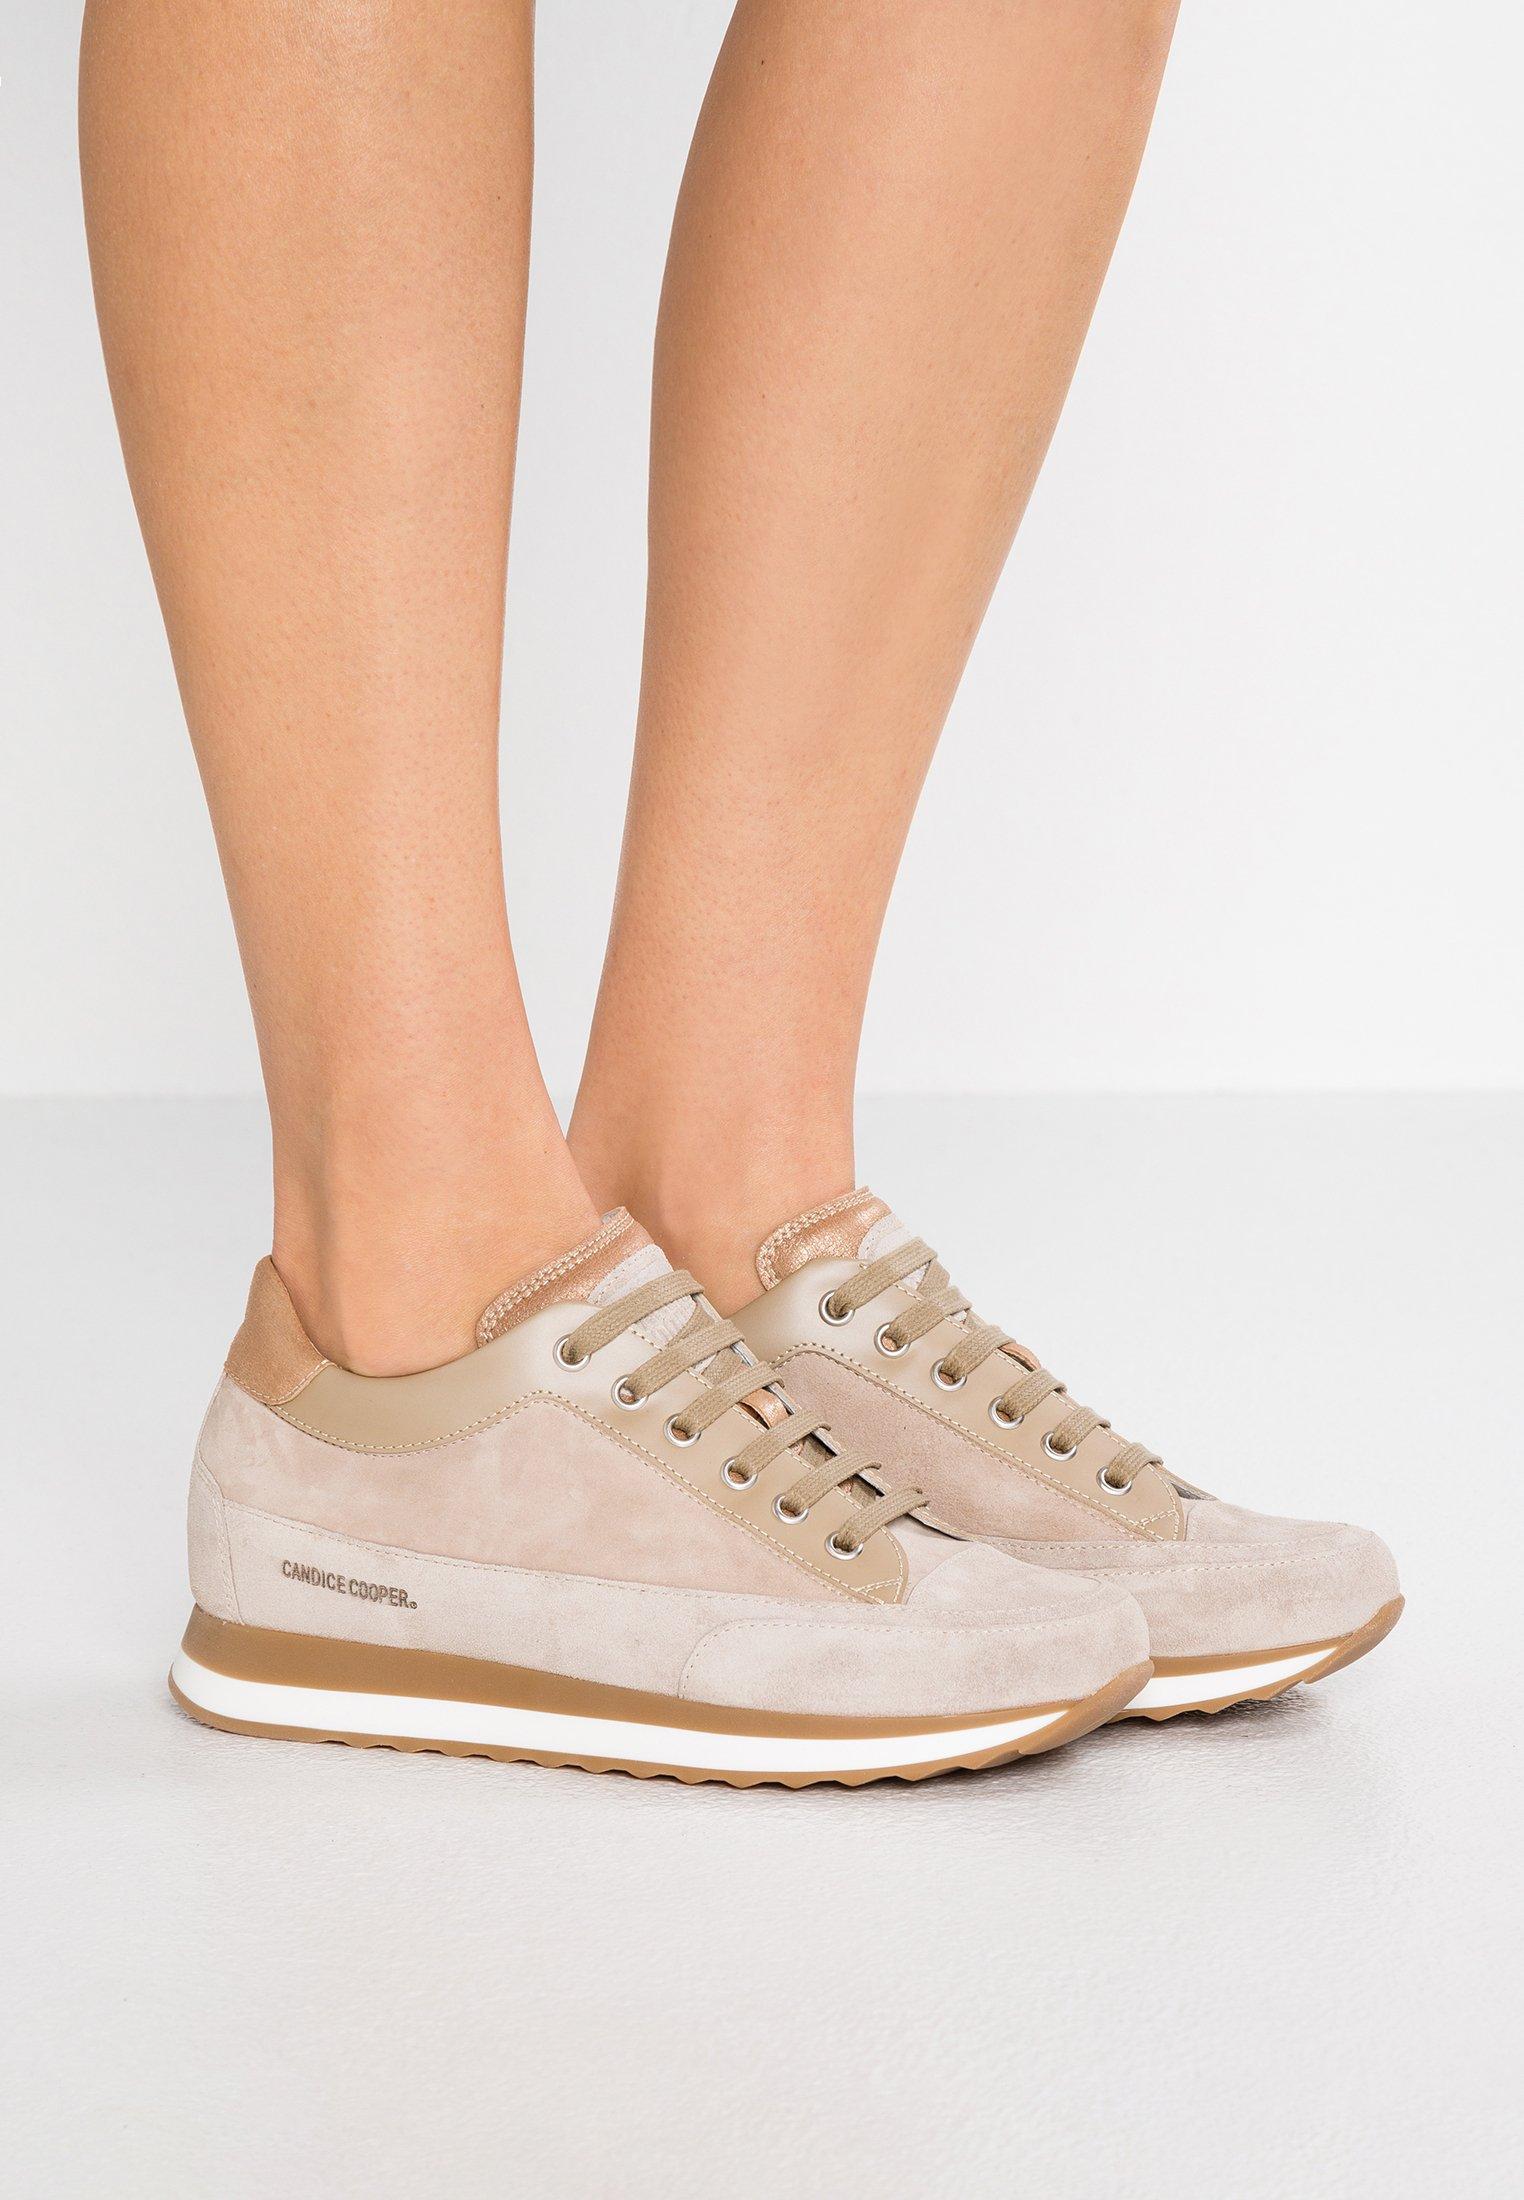 Candice Cooper ROCK SPORT - Sneakers - sabbia/pioppino